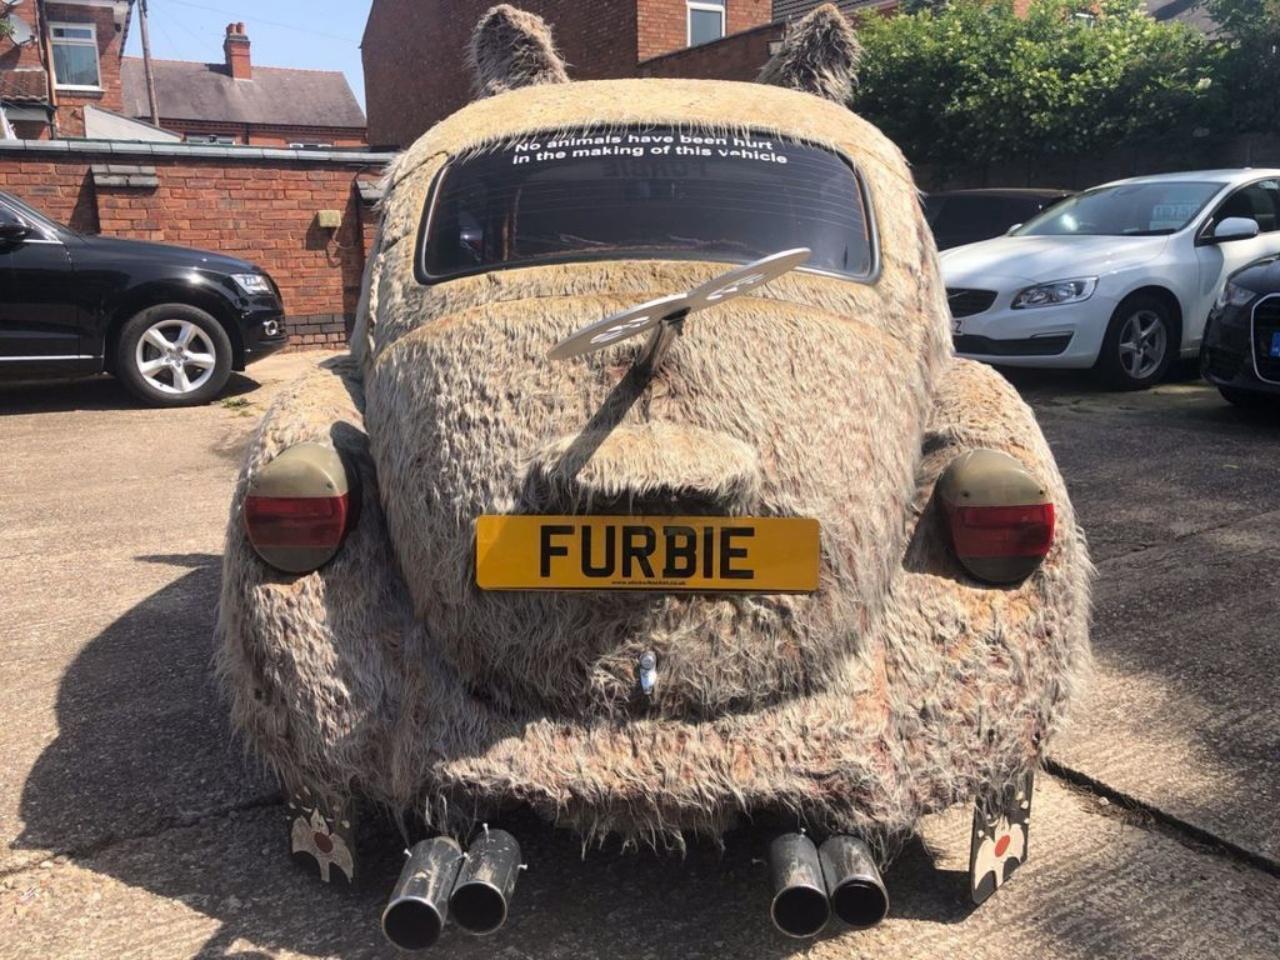 Volkswagen-Beetle-Furbie-1978-4